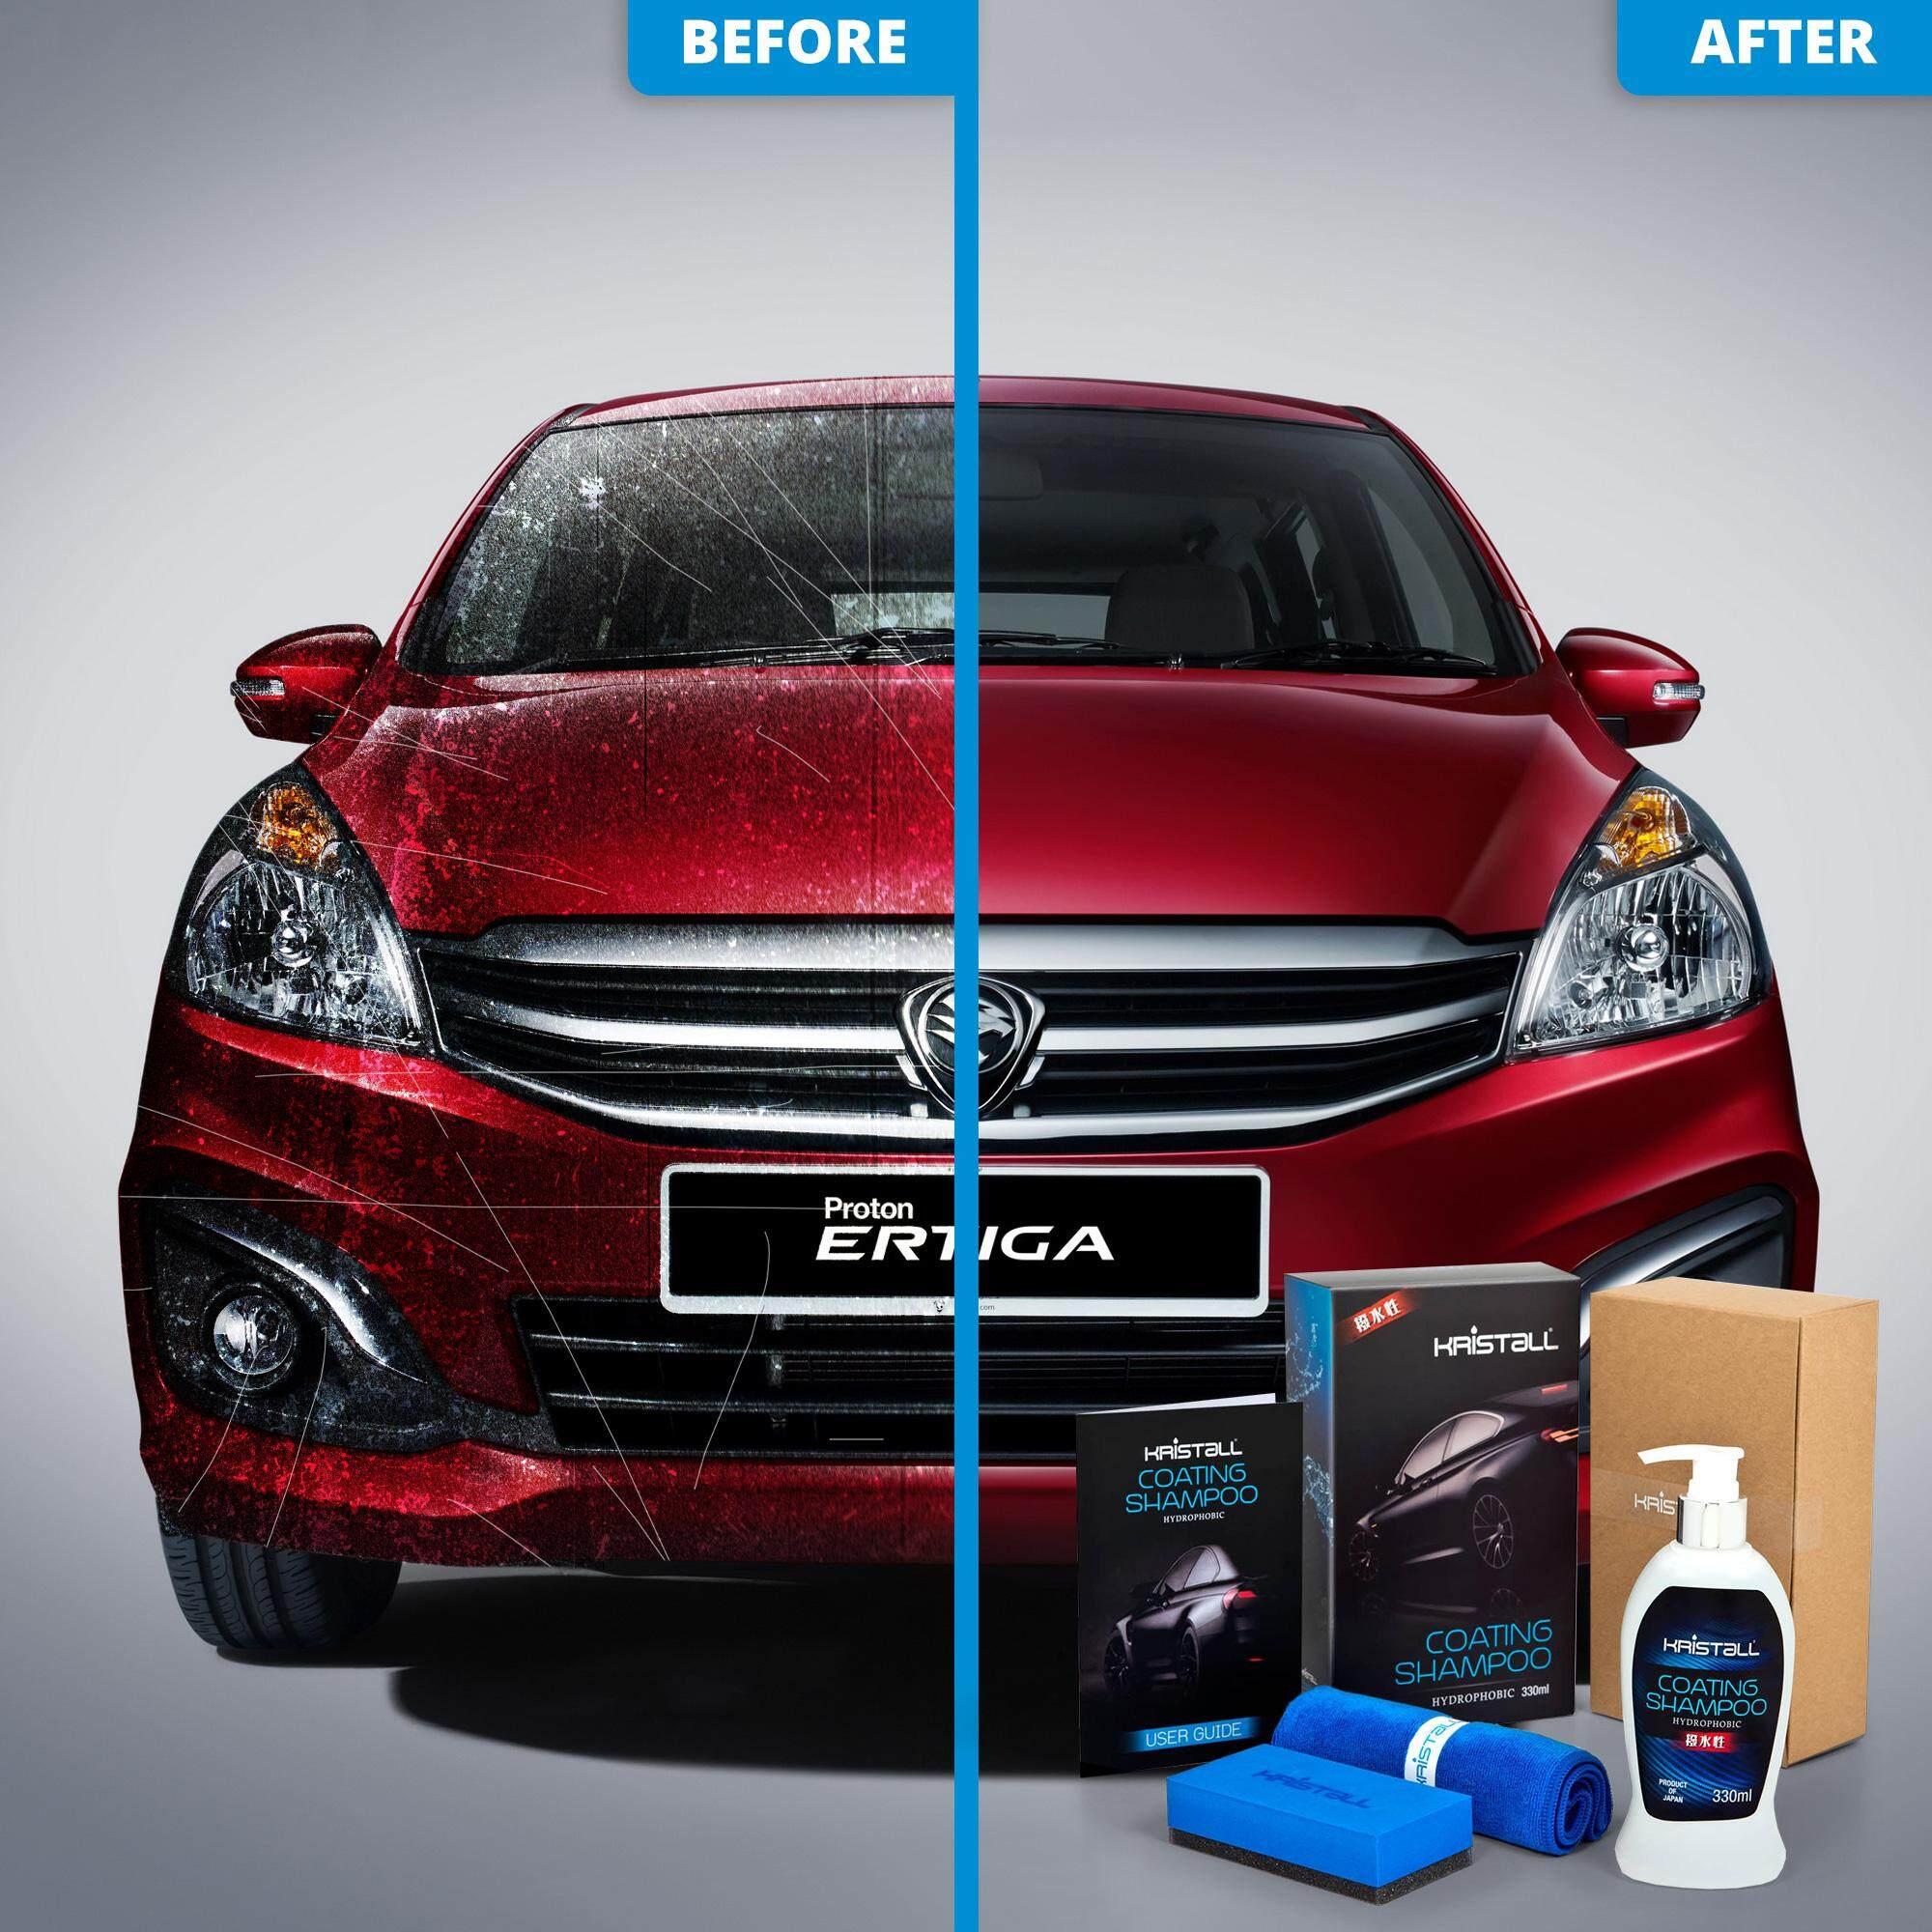 Proton Ertiga MPV Coating Shampoo - Kristall® Car Shampoo WITH Nano Coating (Car Paint Protection, Super Hydrophobic, Deep Gloss, 6.5 pH Balanced Neutral Shampoo)